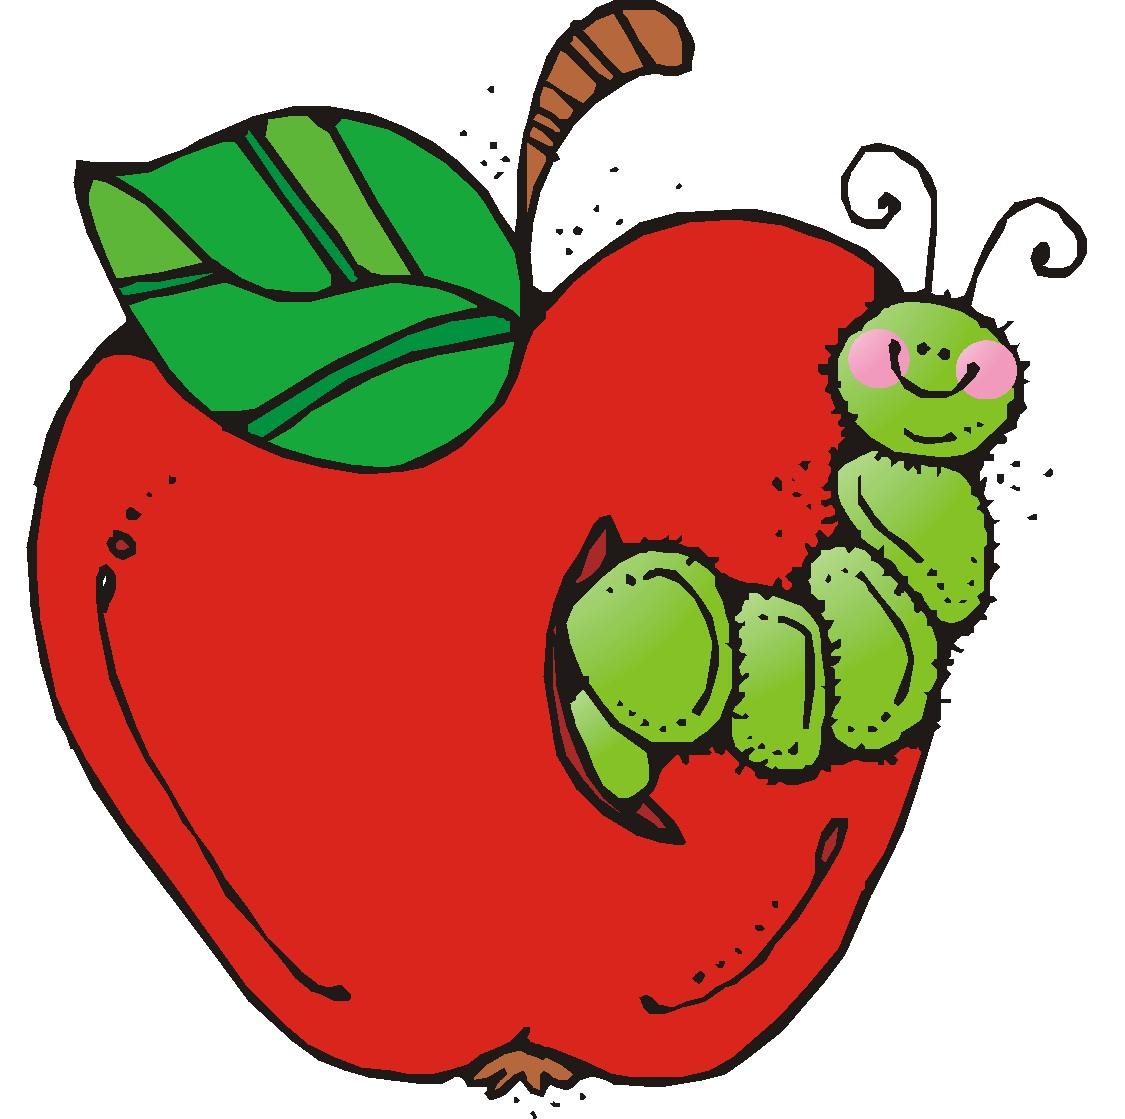 1125x1119 Clip Art Apple Clip Art Images